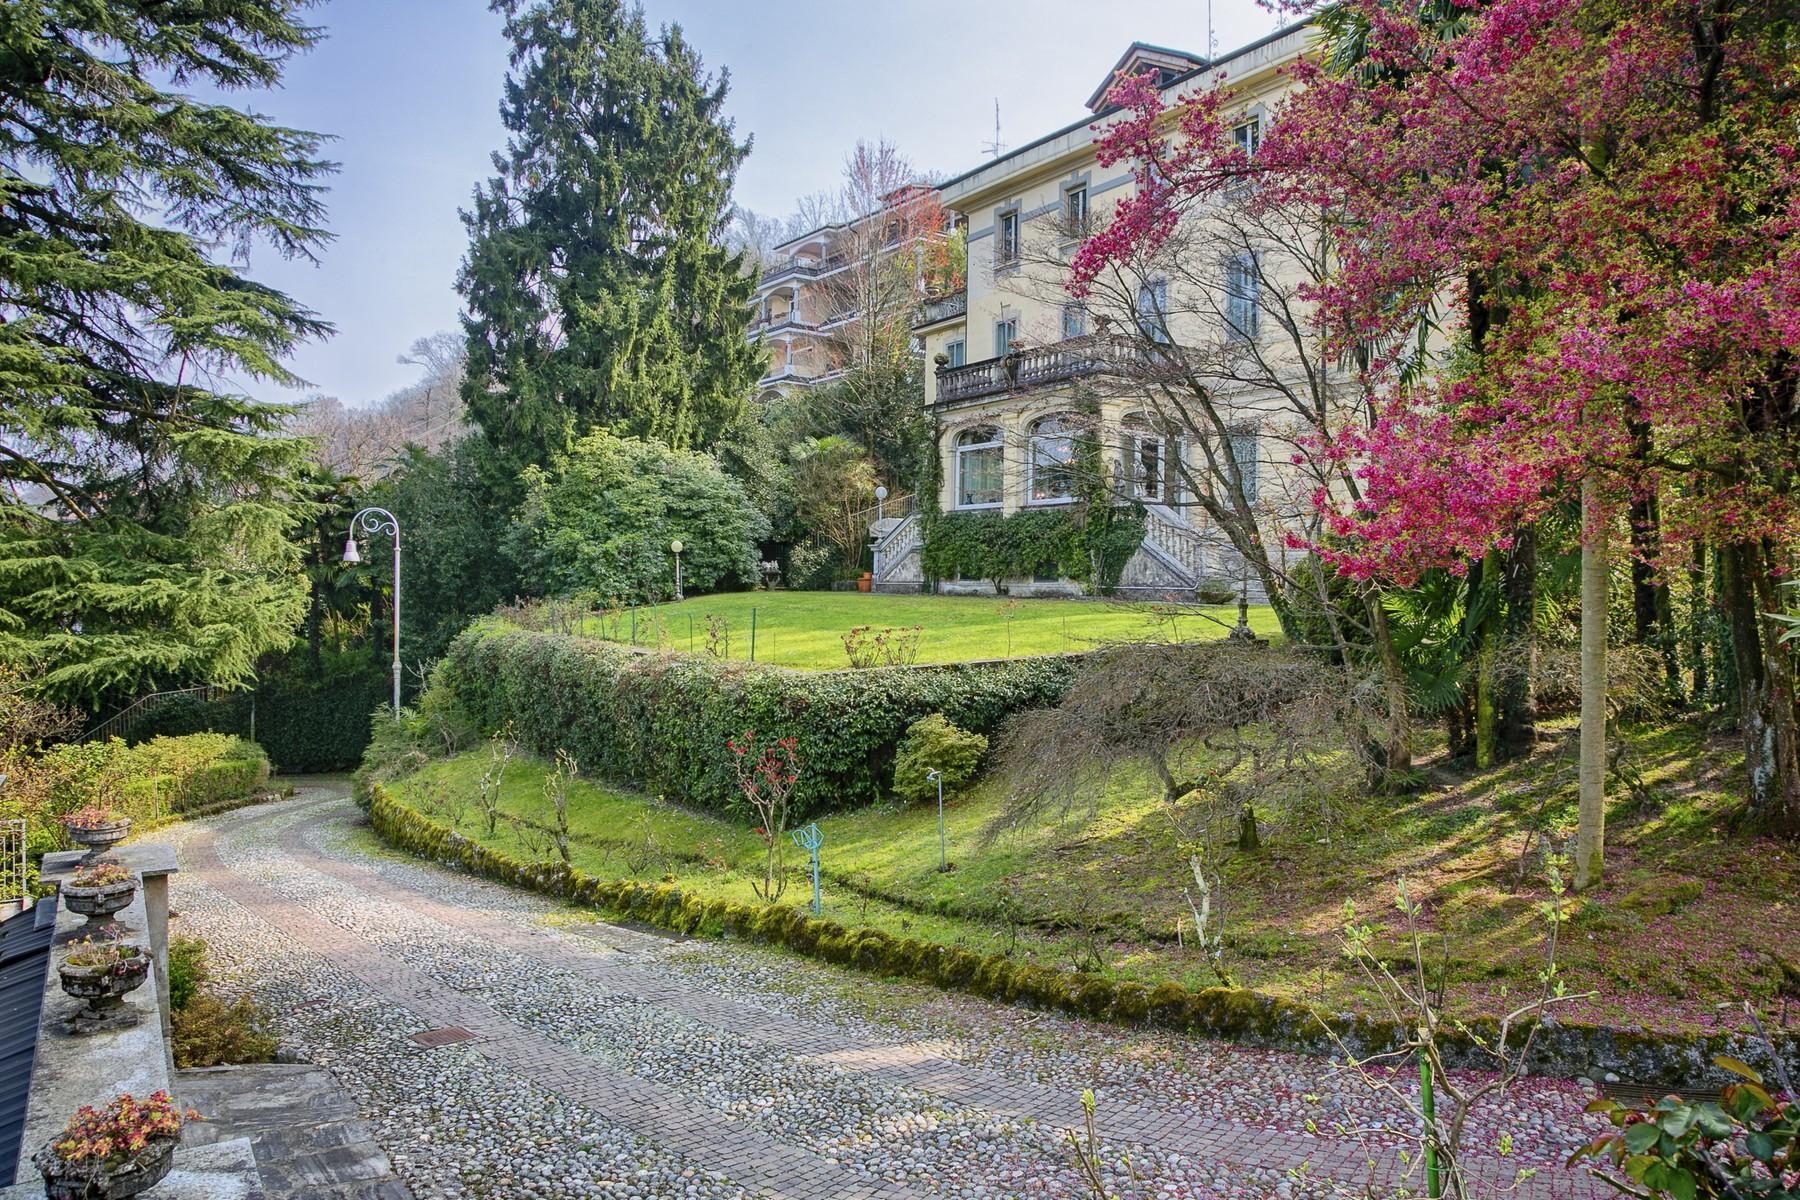 久负盛名的别墅享有Lago Maggiore湖景风光 - 1